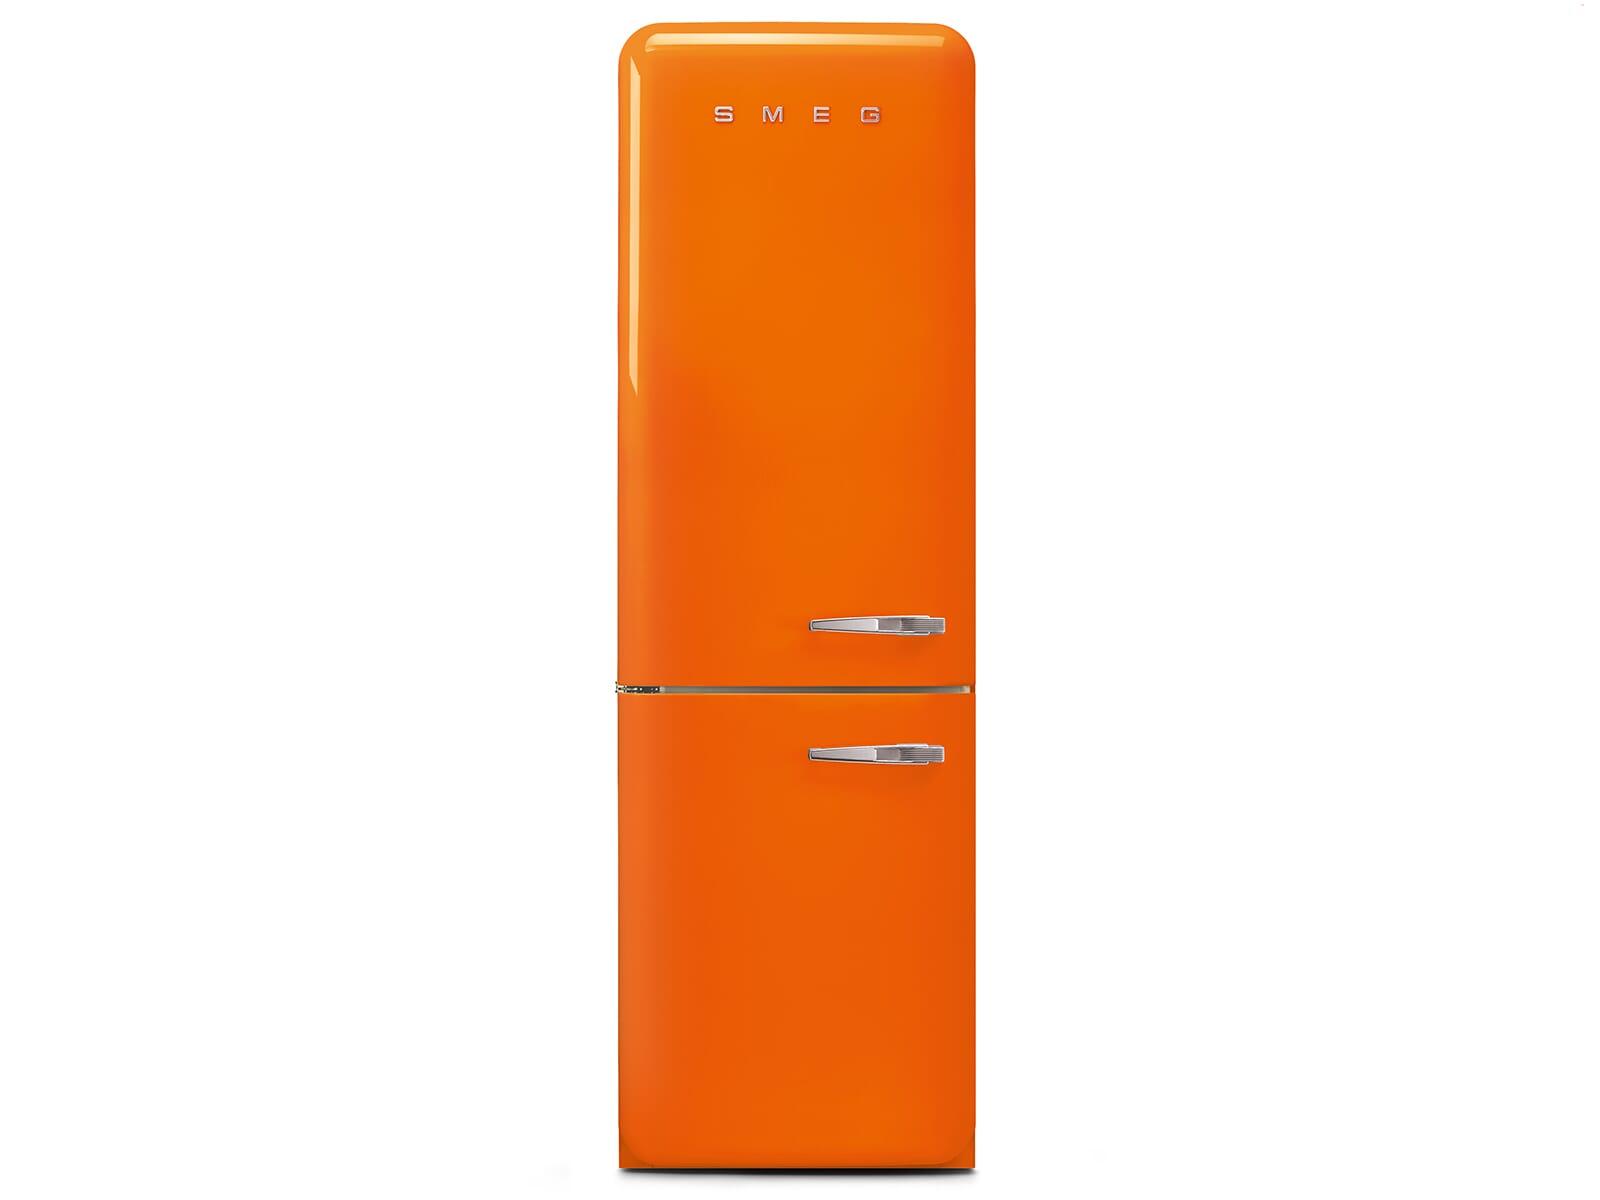 Smeg Kühlschrank Gefrierkombi : Smeg fab lor kühl gefrierkombination orange